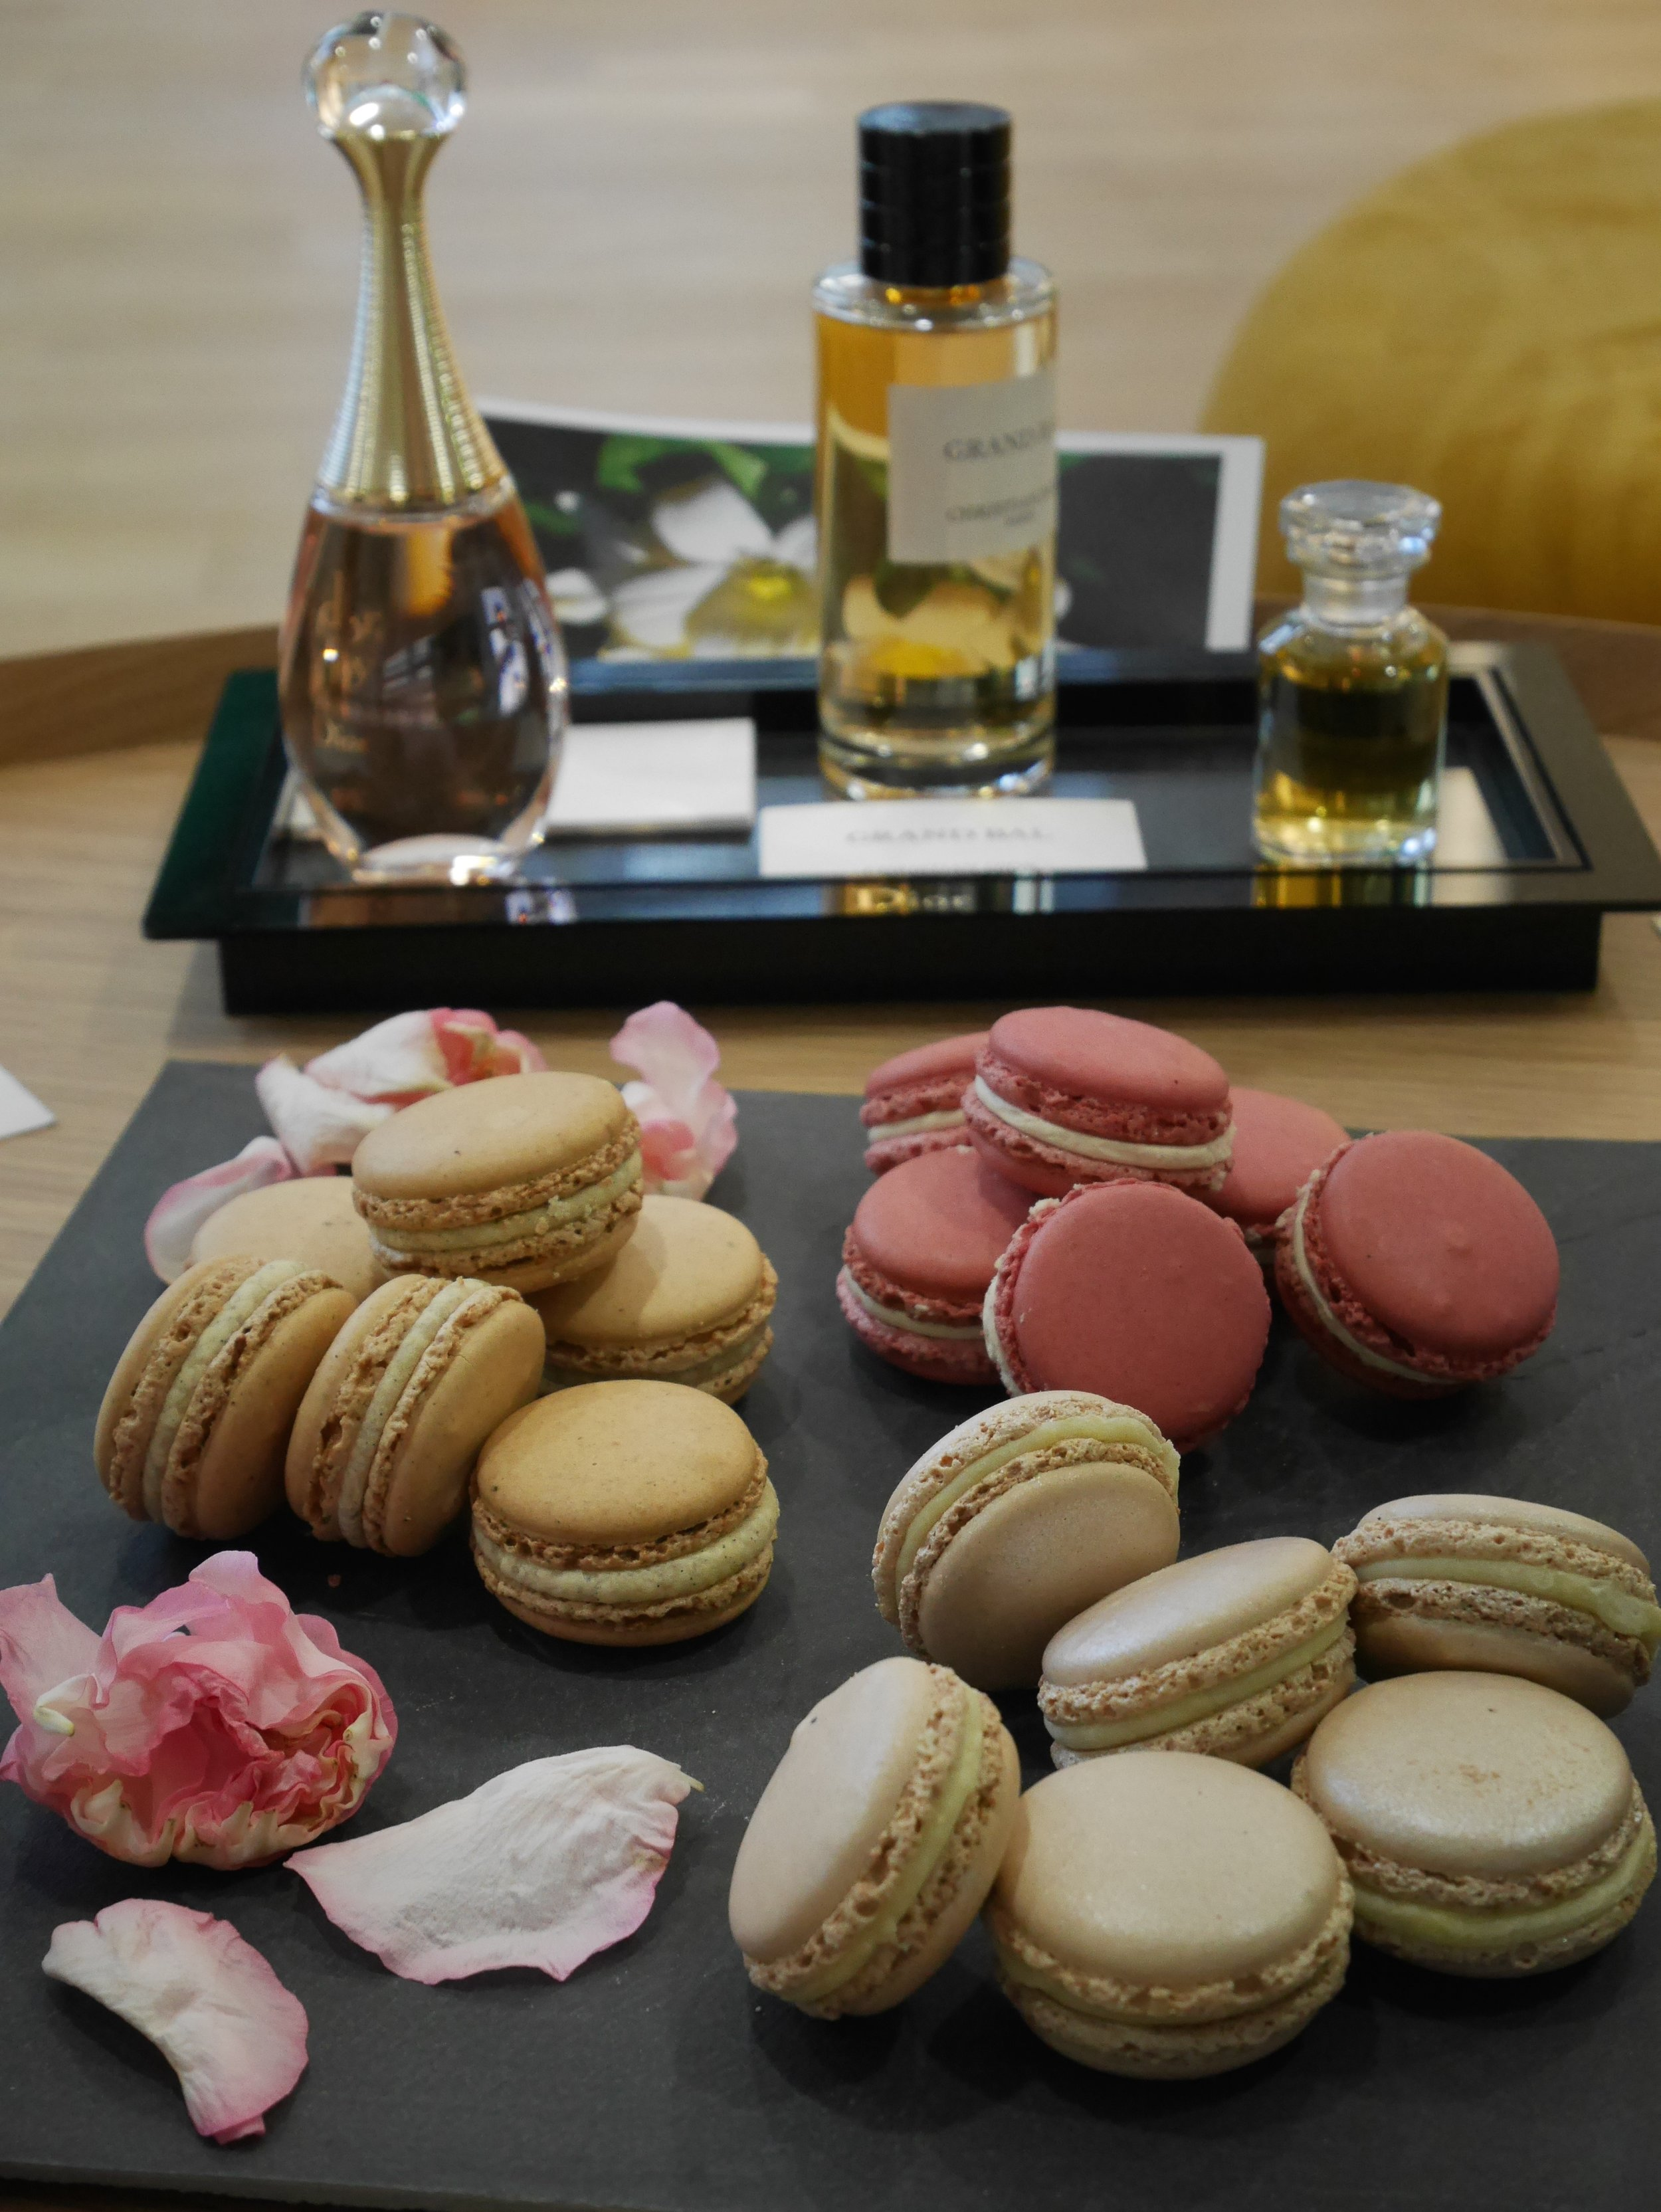 Atelier-olfactif-tea-time-Dior-BHV-elisa-les-bons-tuyaux-3.jpg